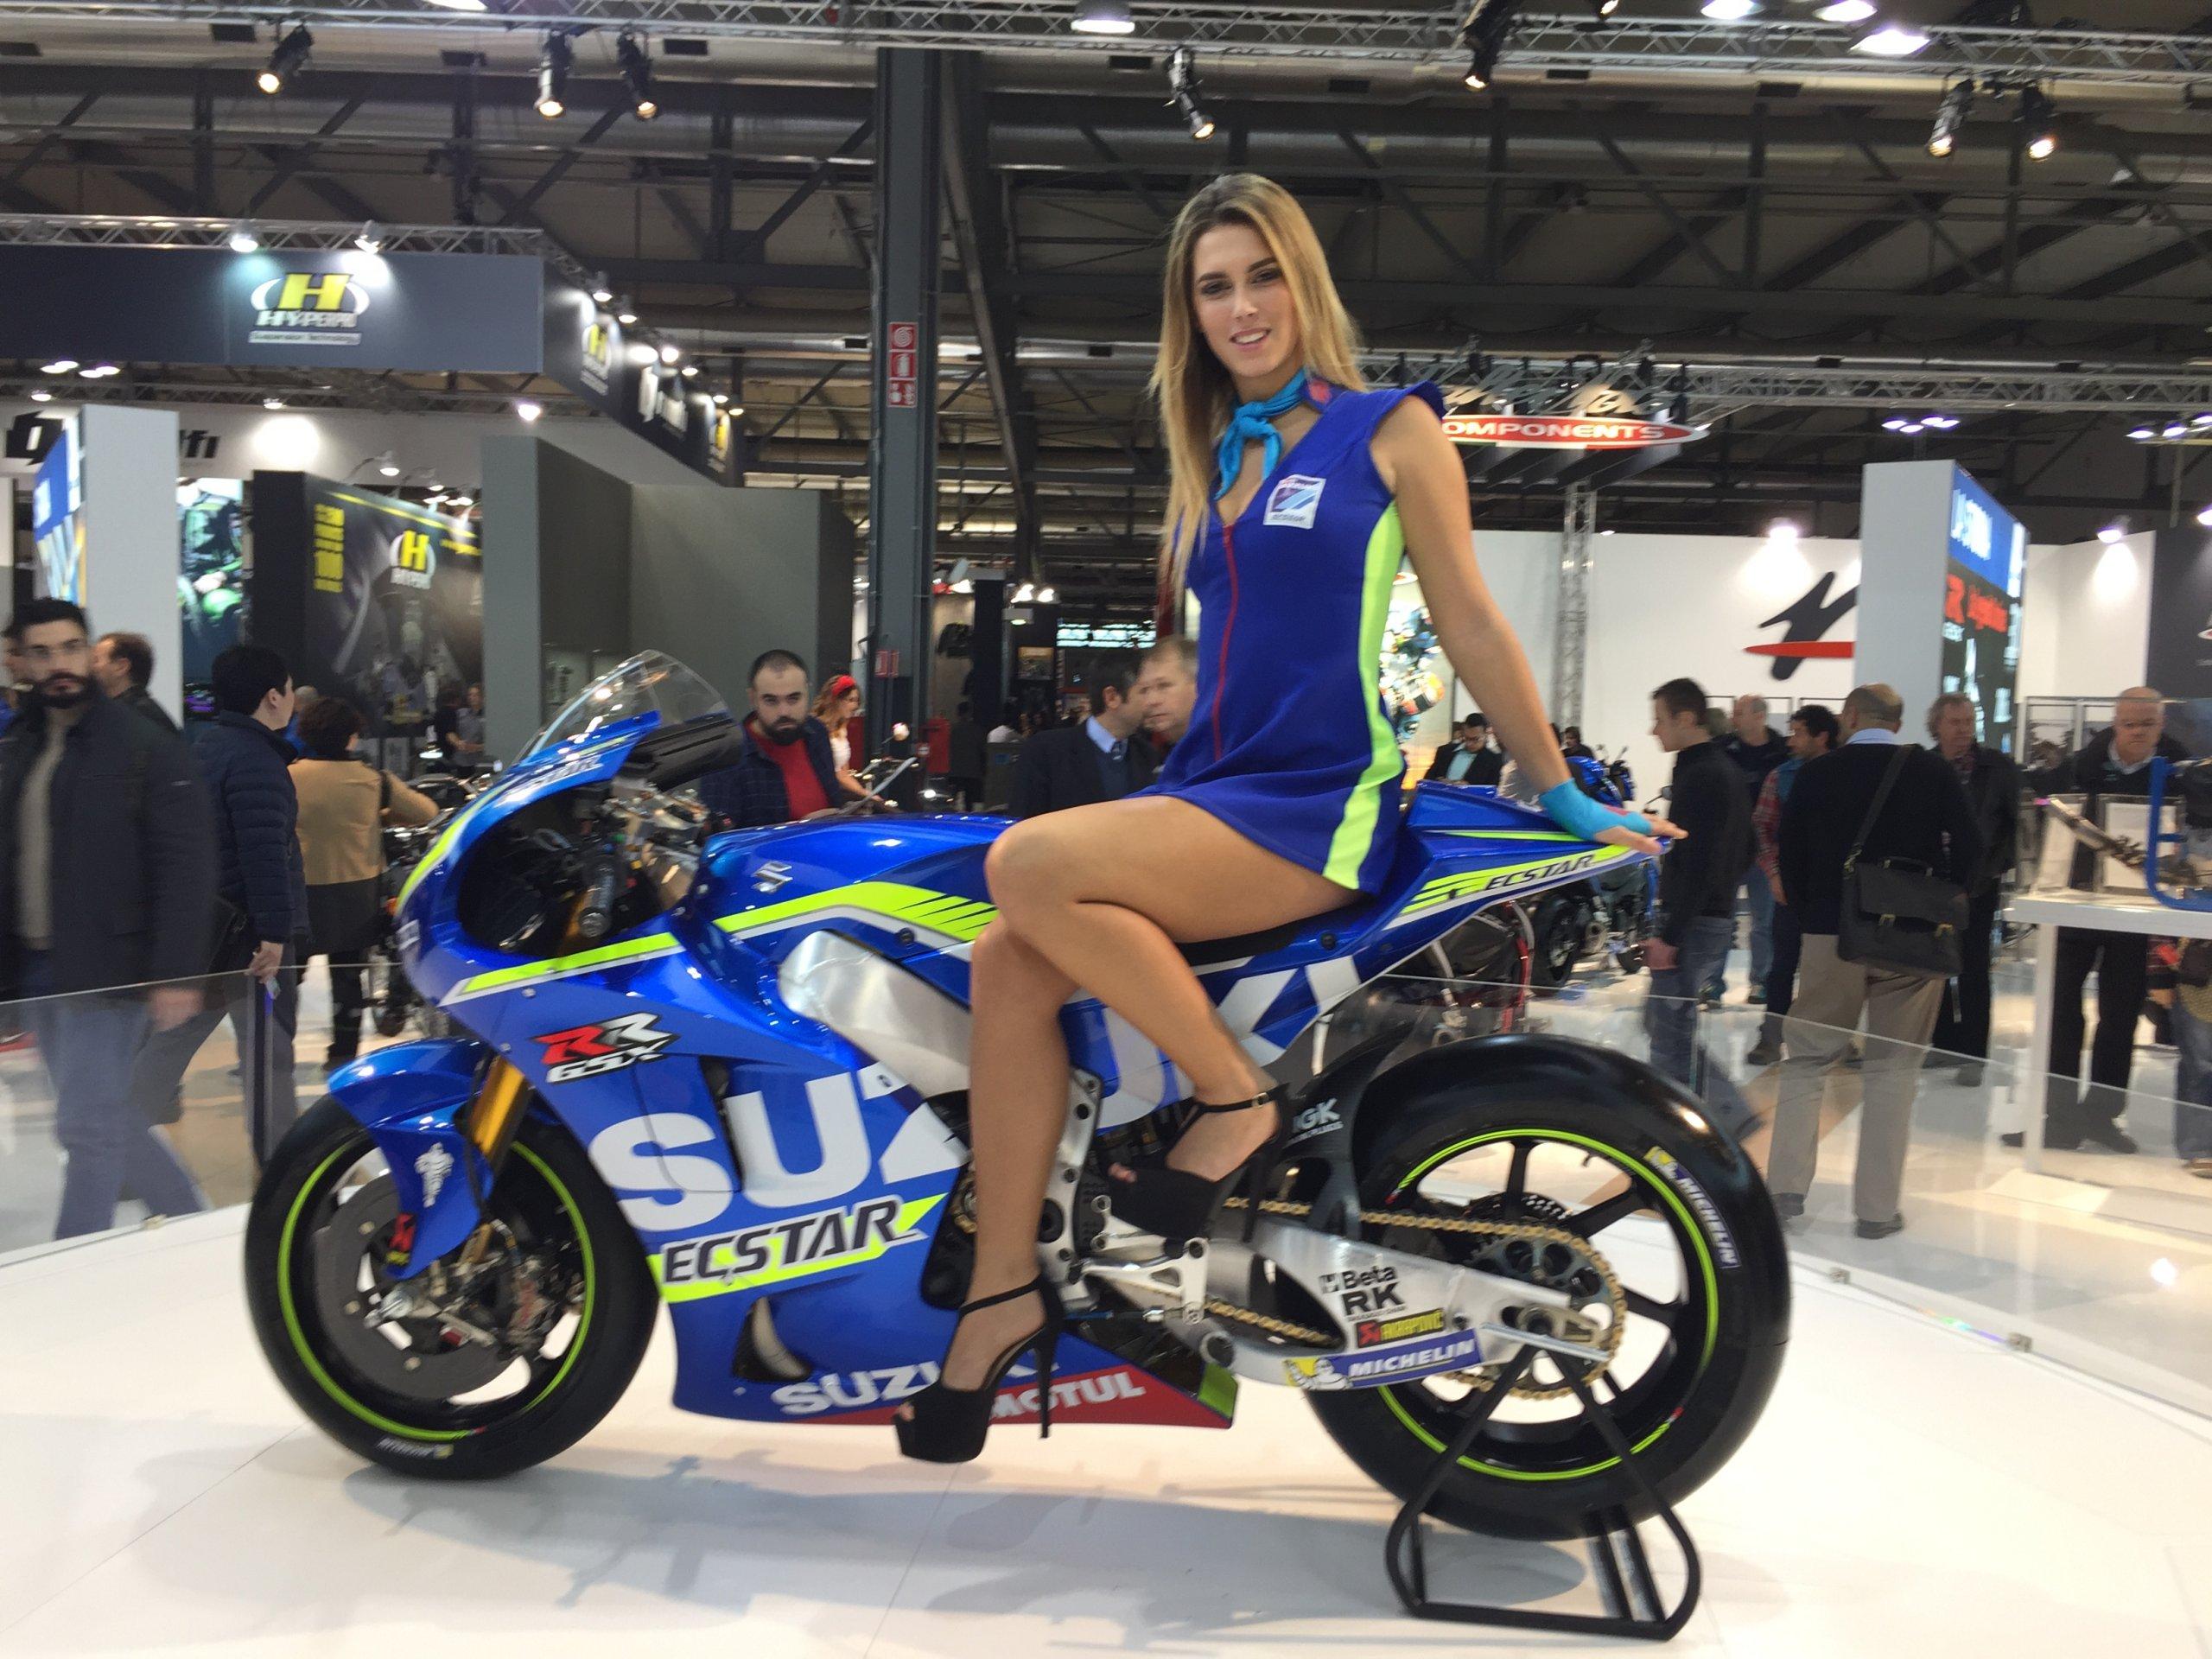 MotoGP 2016... - Page 2 2b8b310c-899e-4561-9cc7-ed84ba2faaff